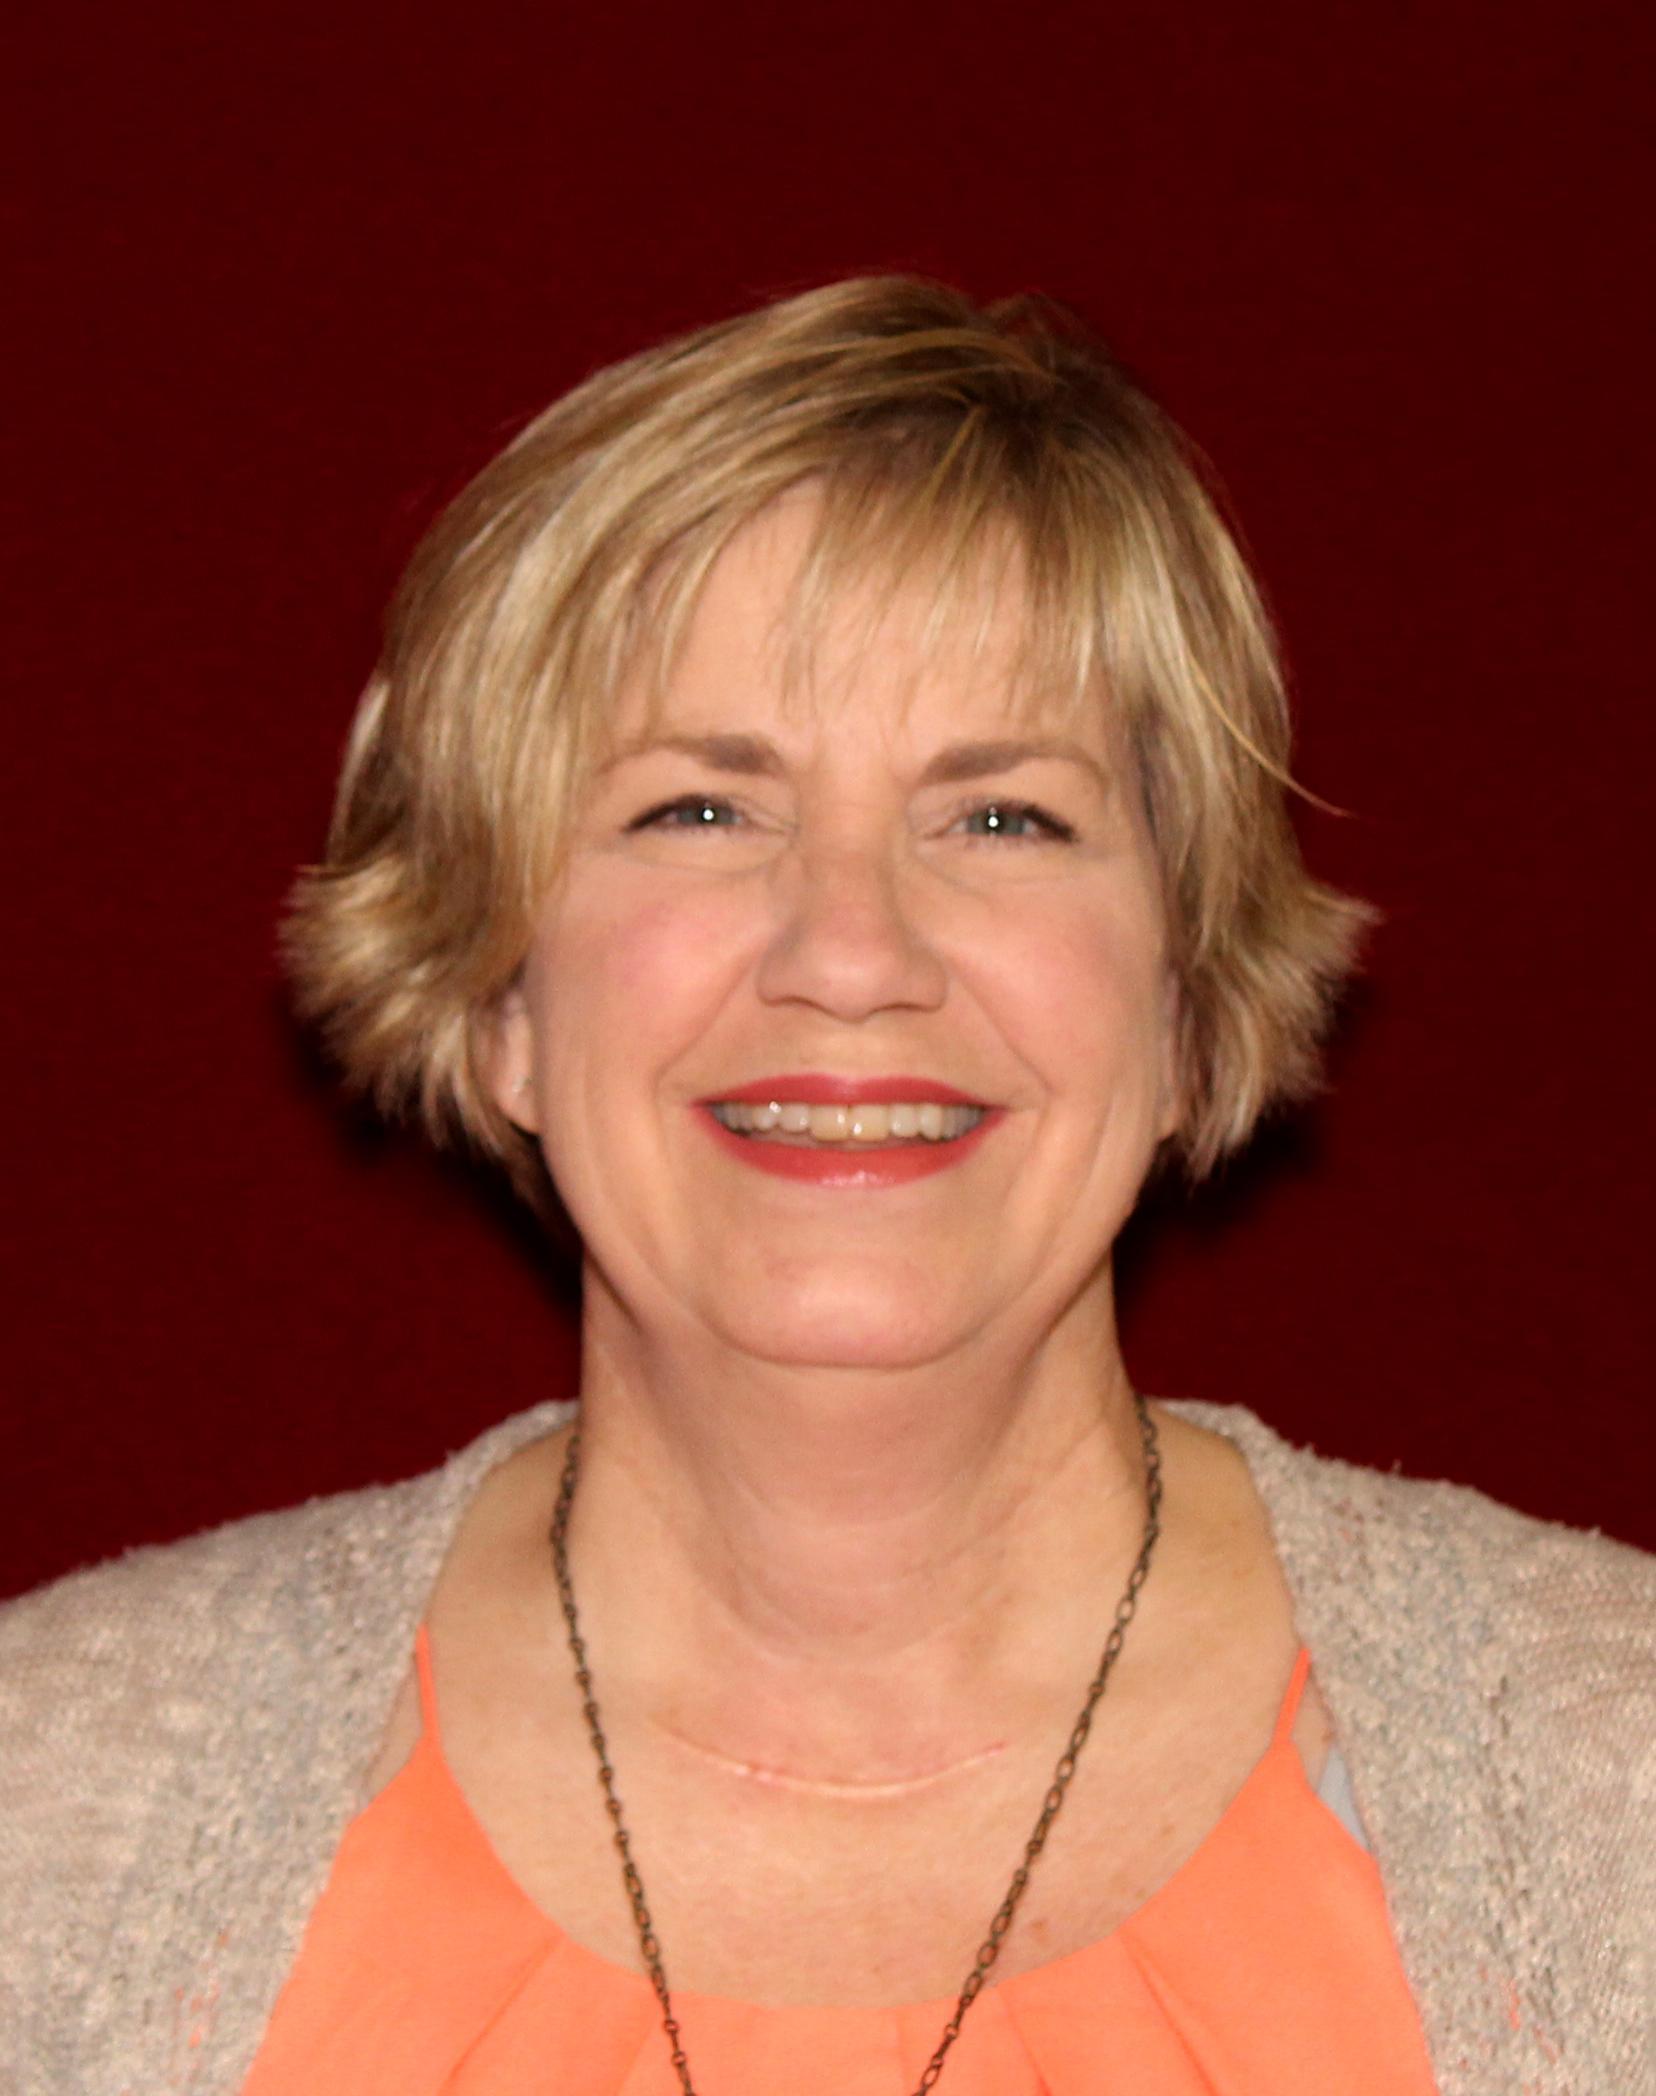 photo of Cheryl Eddy